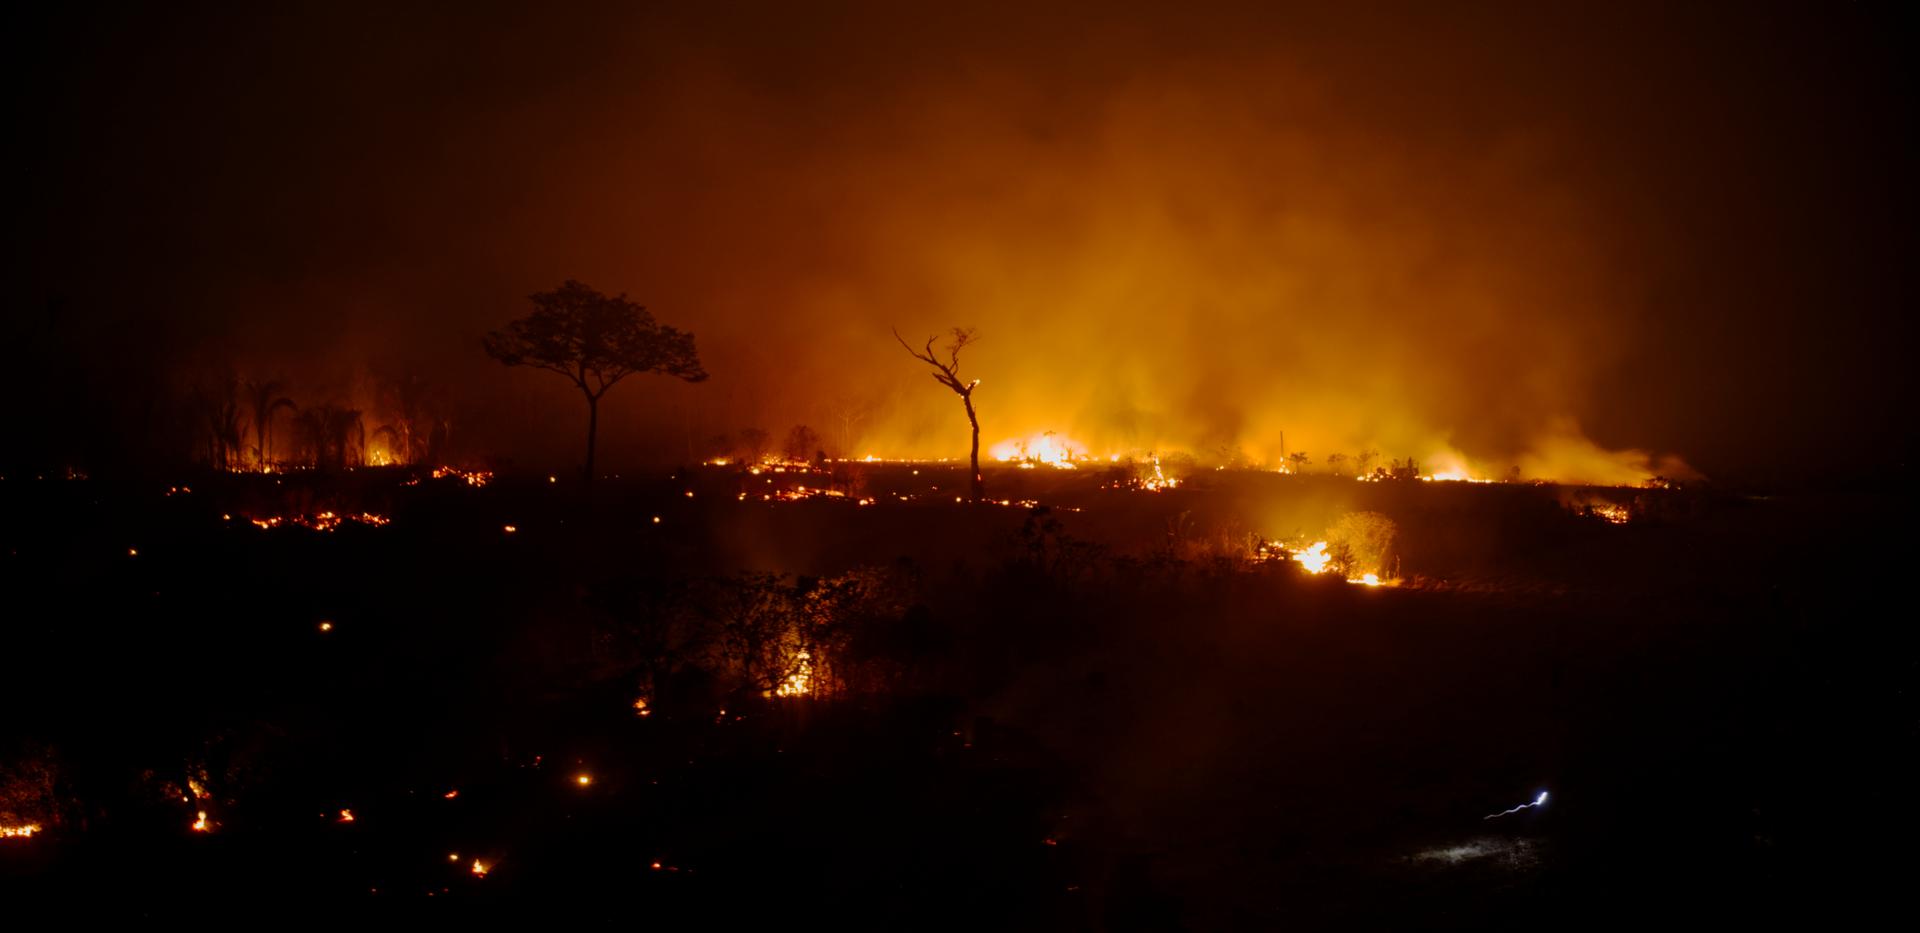 BOLIVIA-AMAZONíA-ESTEBAN BARRERA